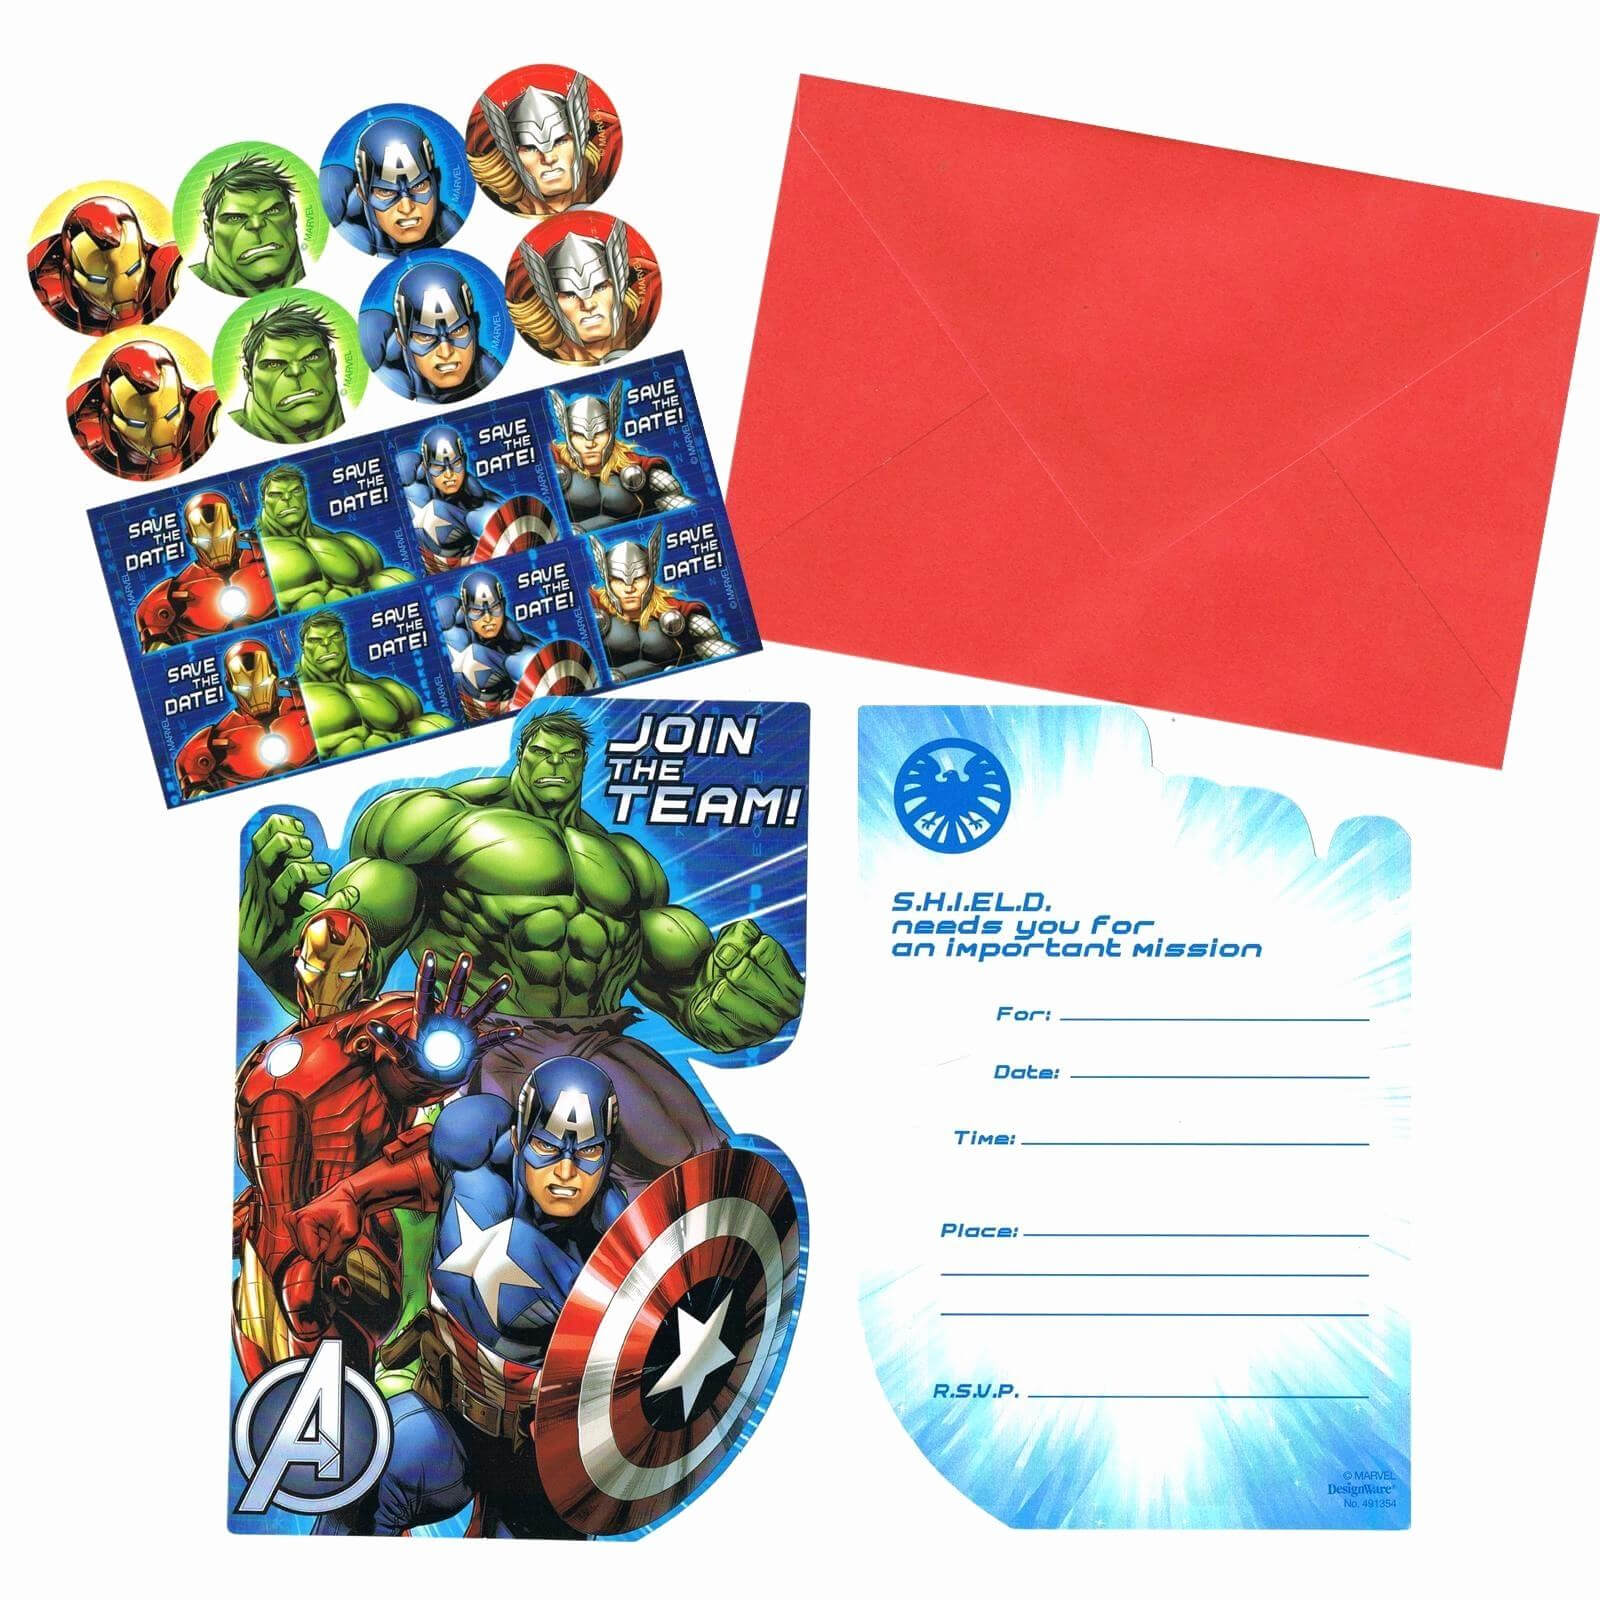 Avengers Birthday Card Invitations Infinity War Party Pertaining To Avengers Birthday Card Template